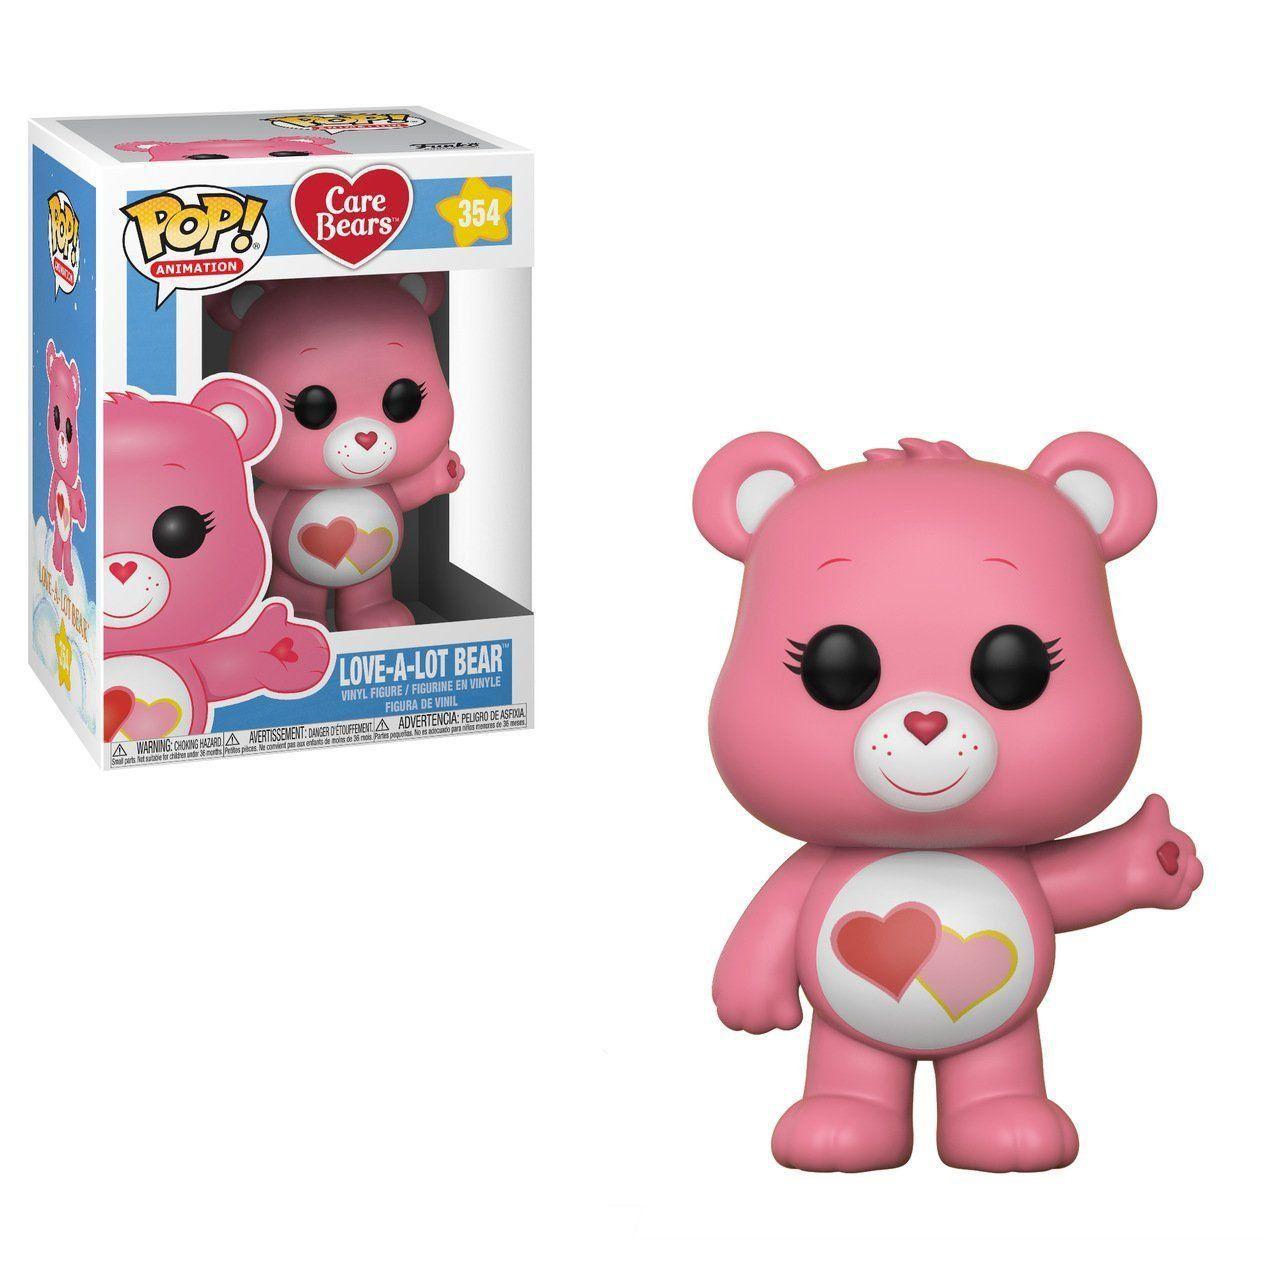 PRÉ VENDA: Funko Pop! Love-A-Lot Bear: Care Bears #354 - Funko